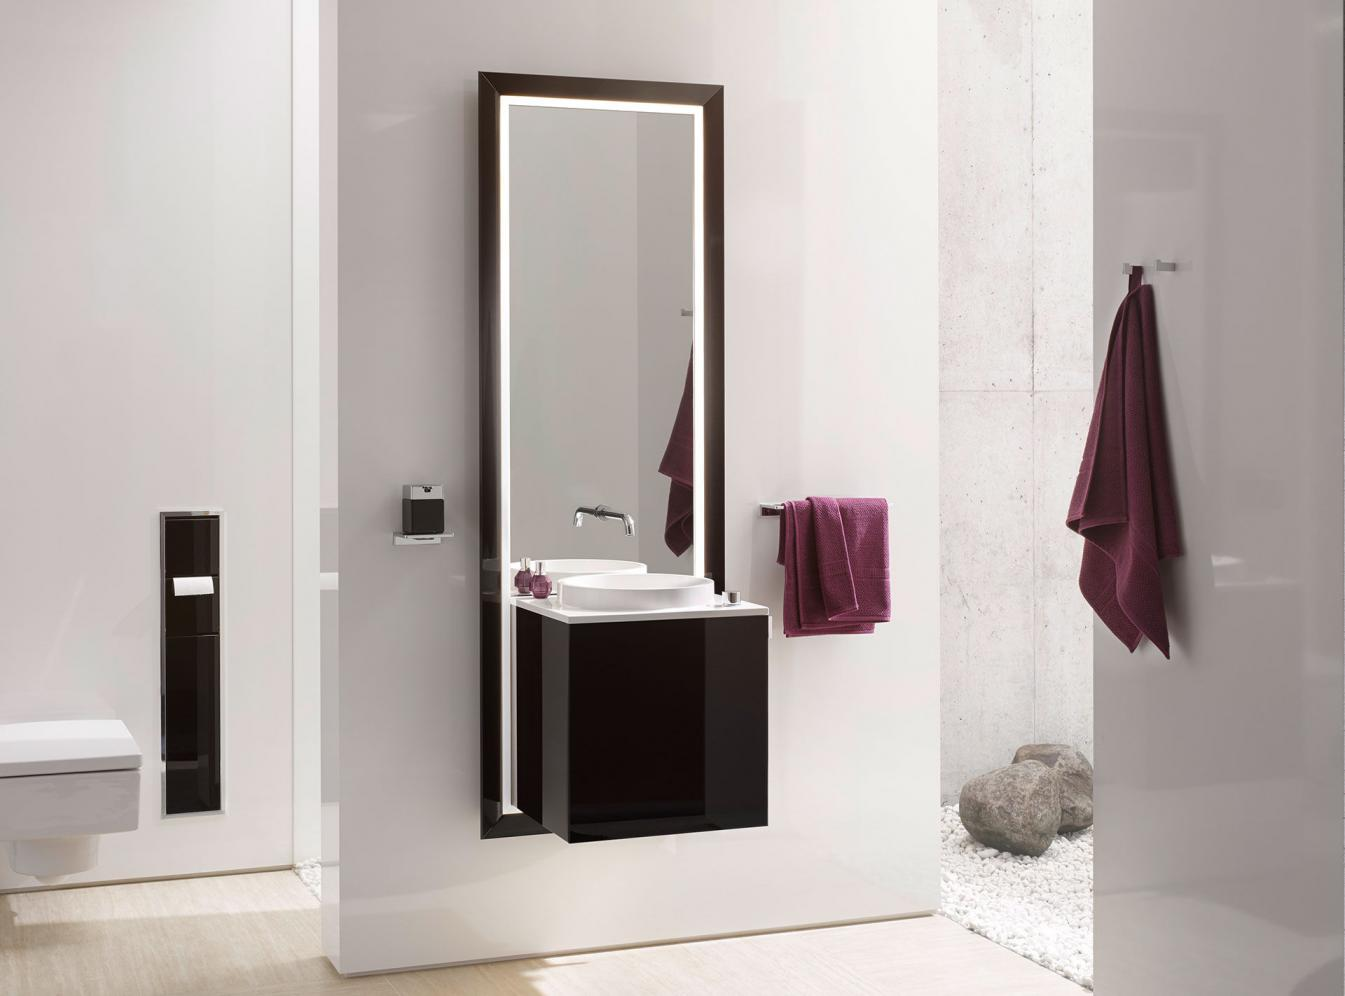 emco touch pure badm bel f r jedermann. Black Bedroom Furniture Sets. Home Design Ideas